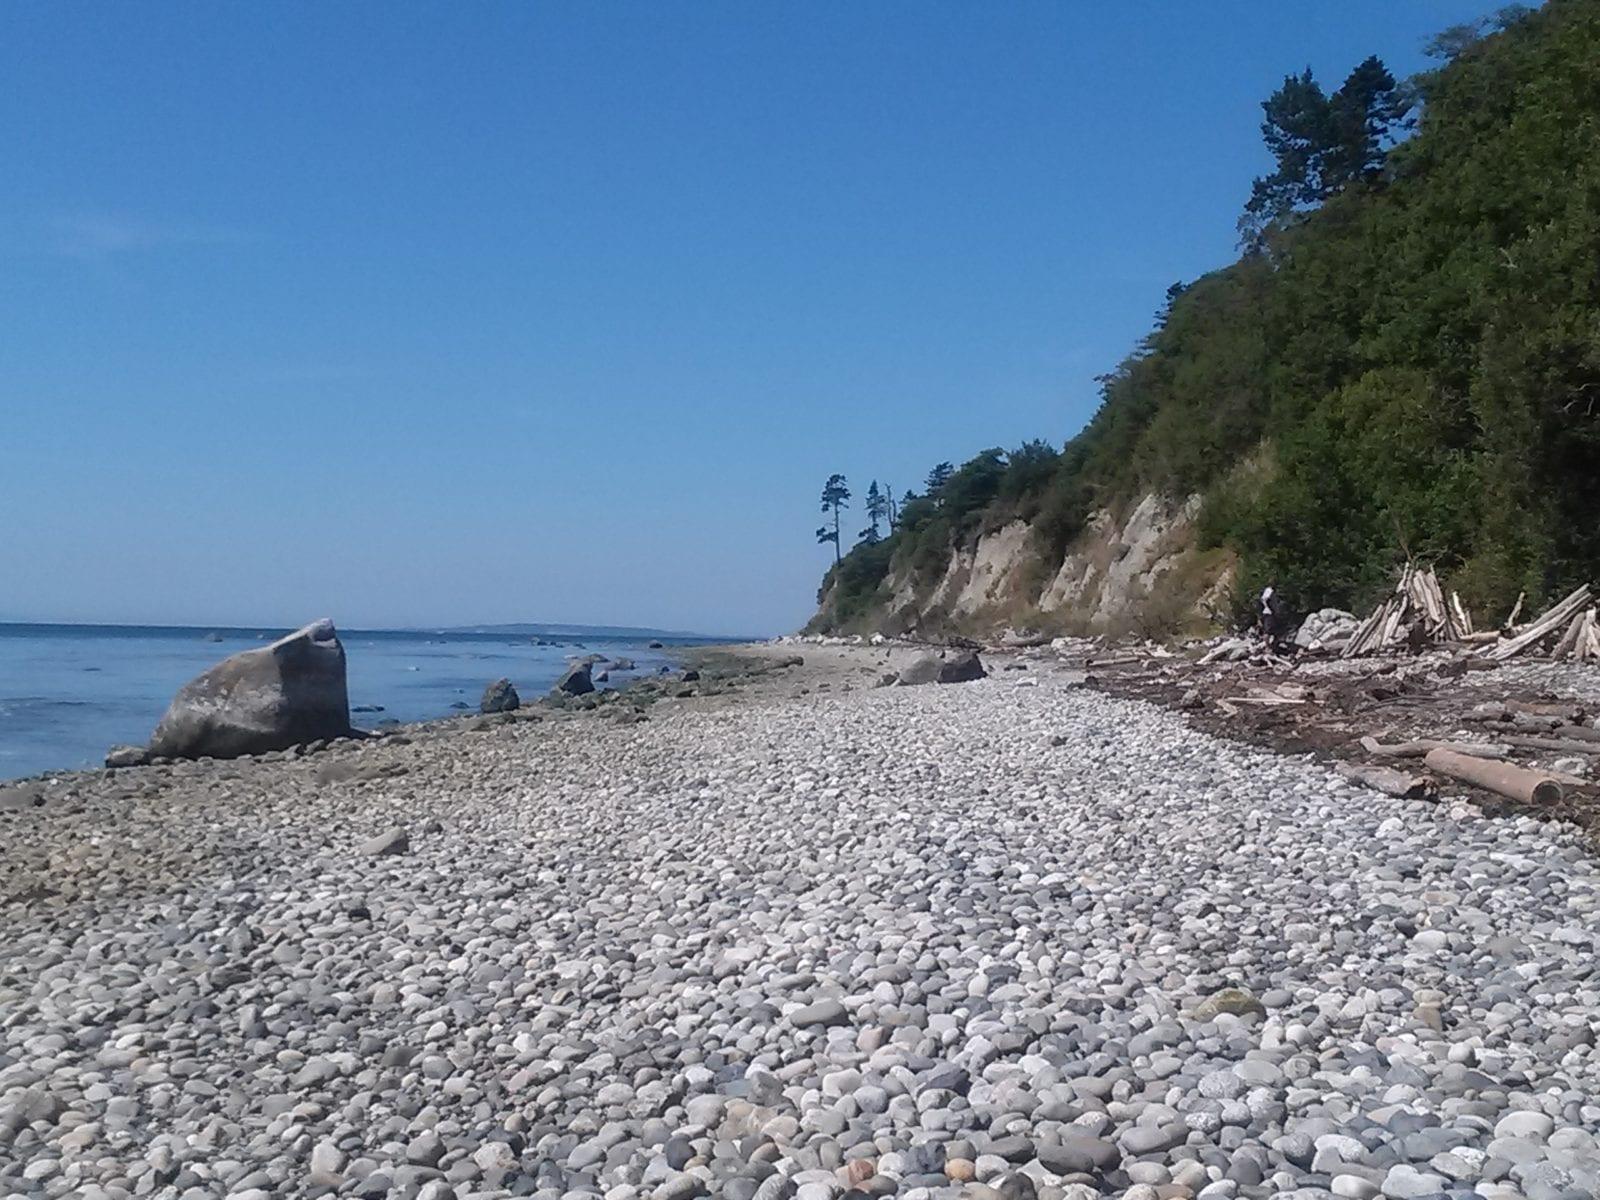 Rocky beach at Pt. Whitehorn